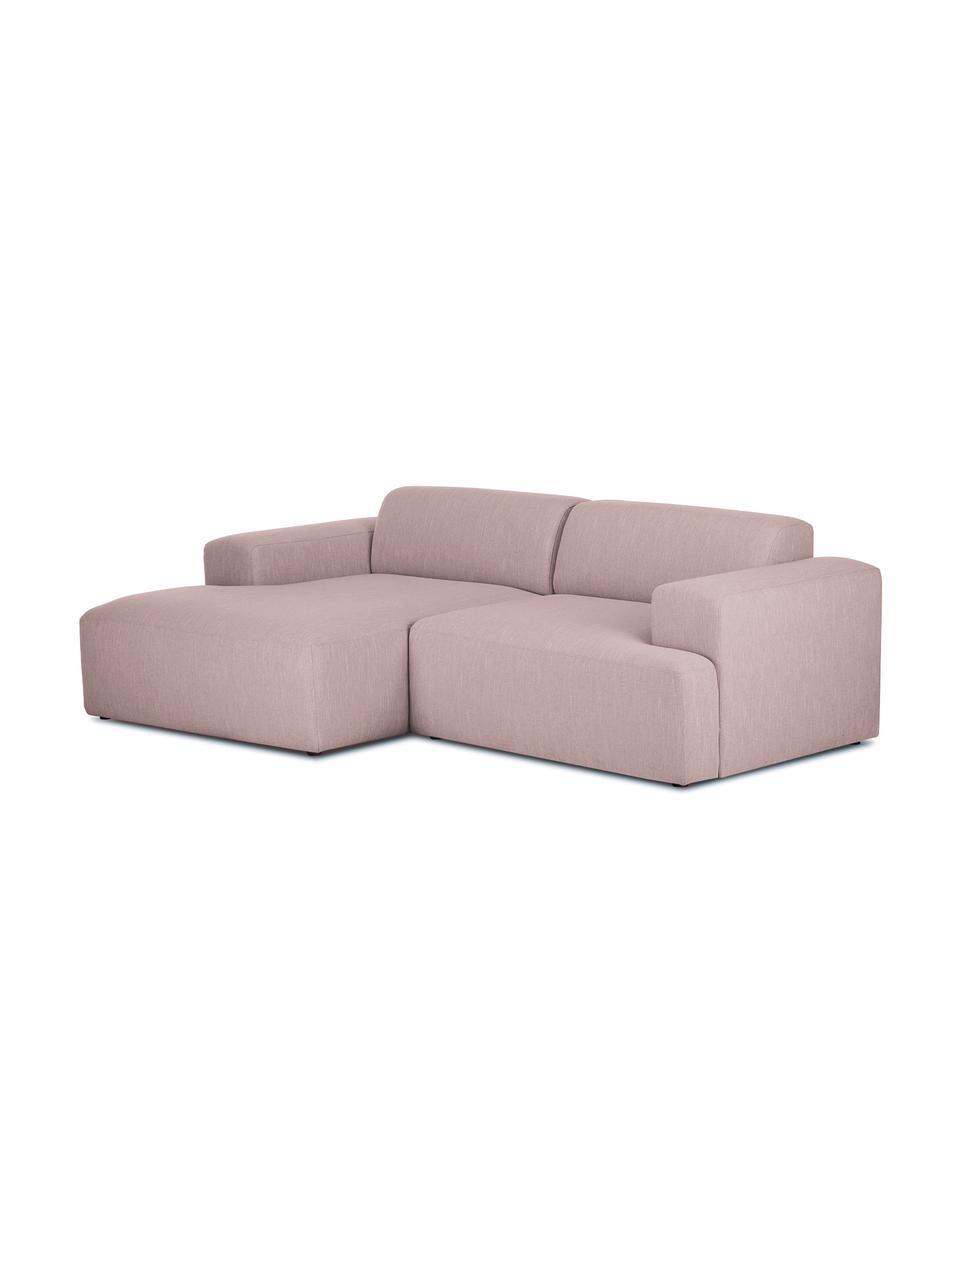 Canapé d'angle 3places rose Melva, Tissu rose